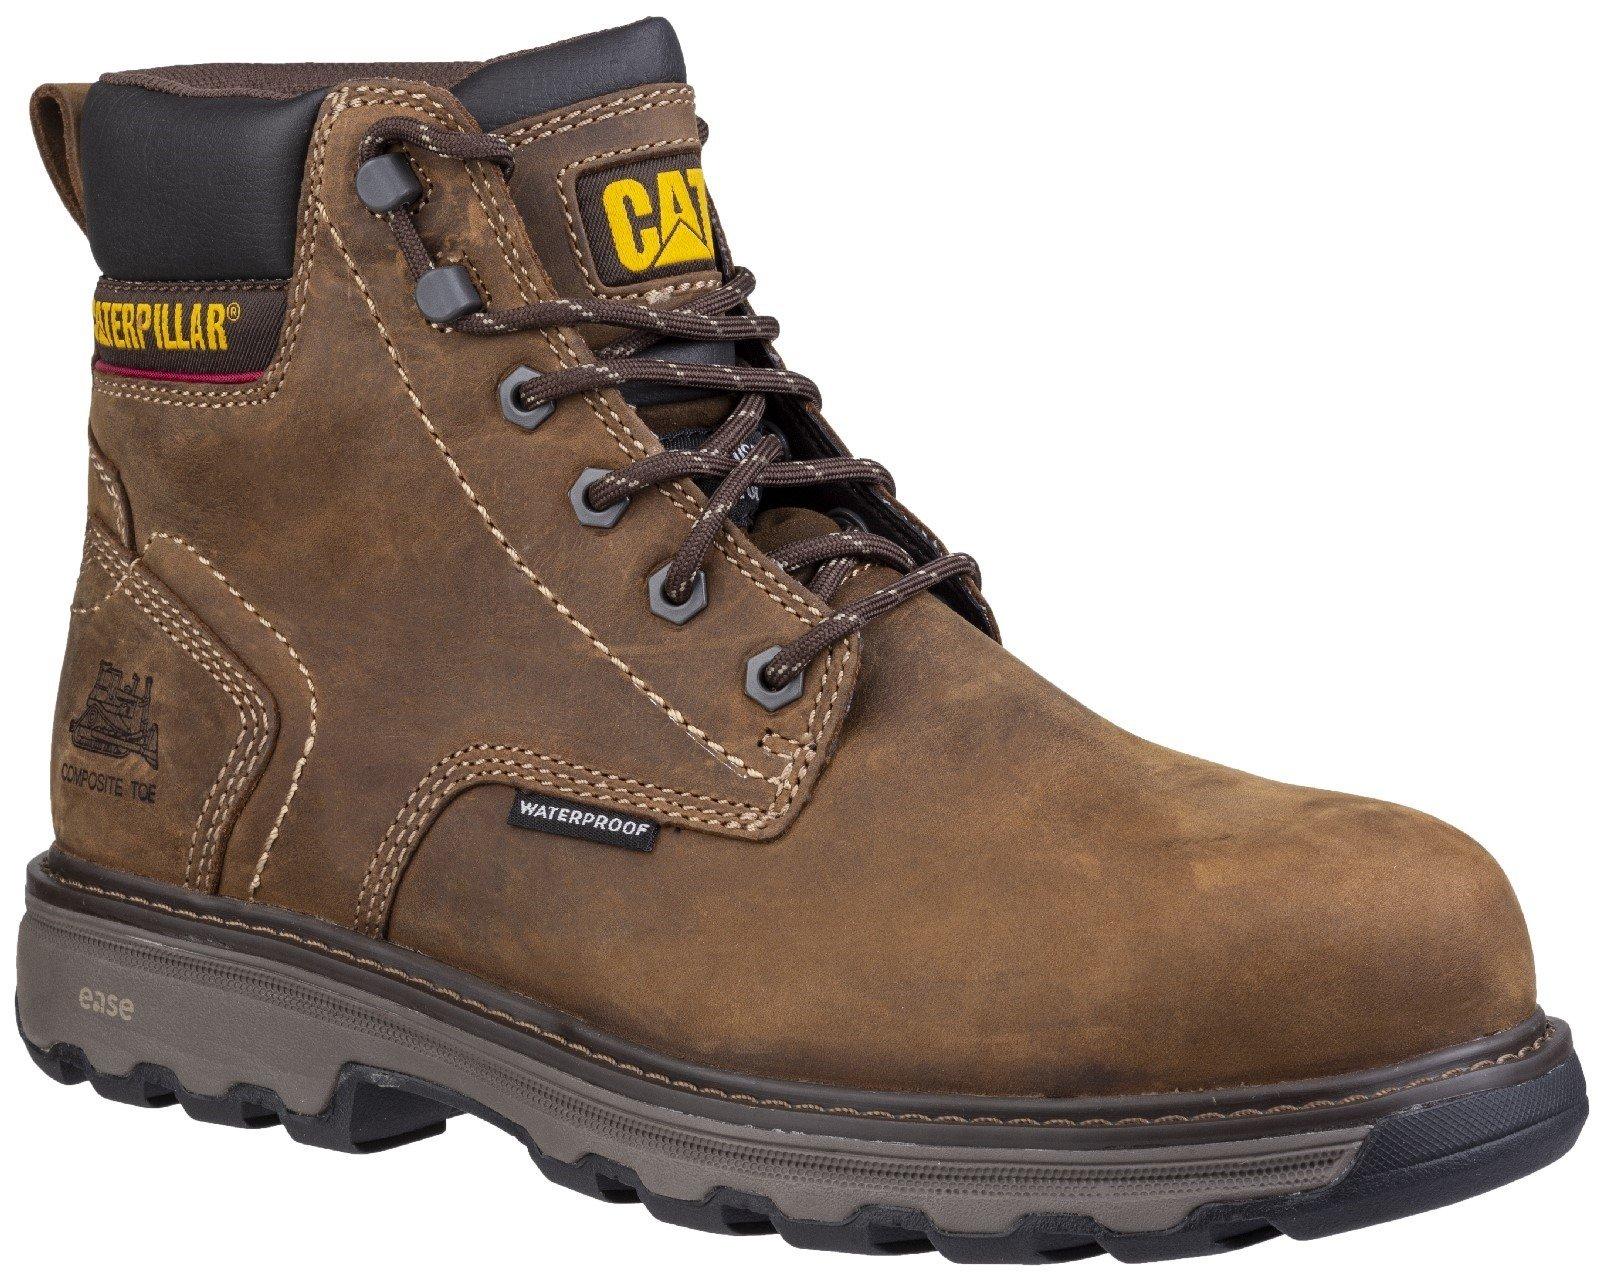 Caterpillar Men's Precision Lace Up Boot Dark Brown 28173 - Dark Brown 6